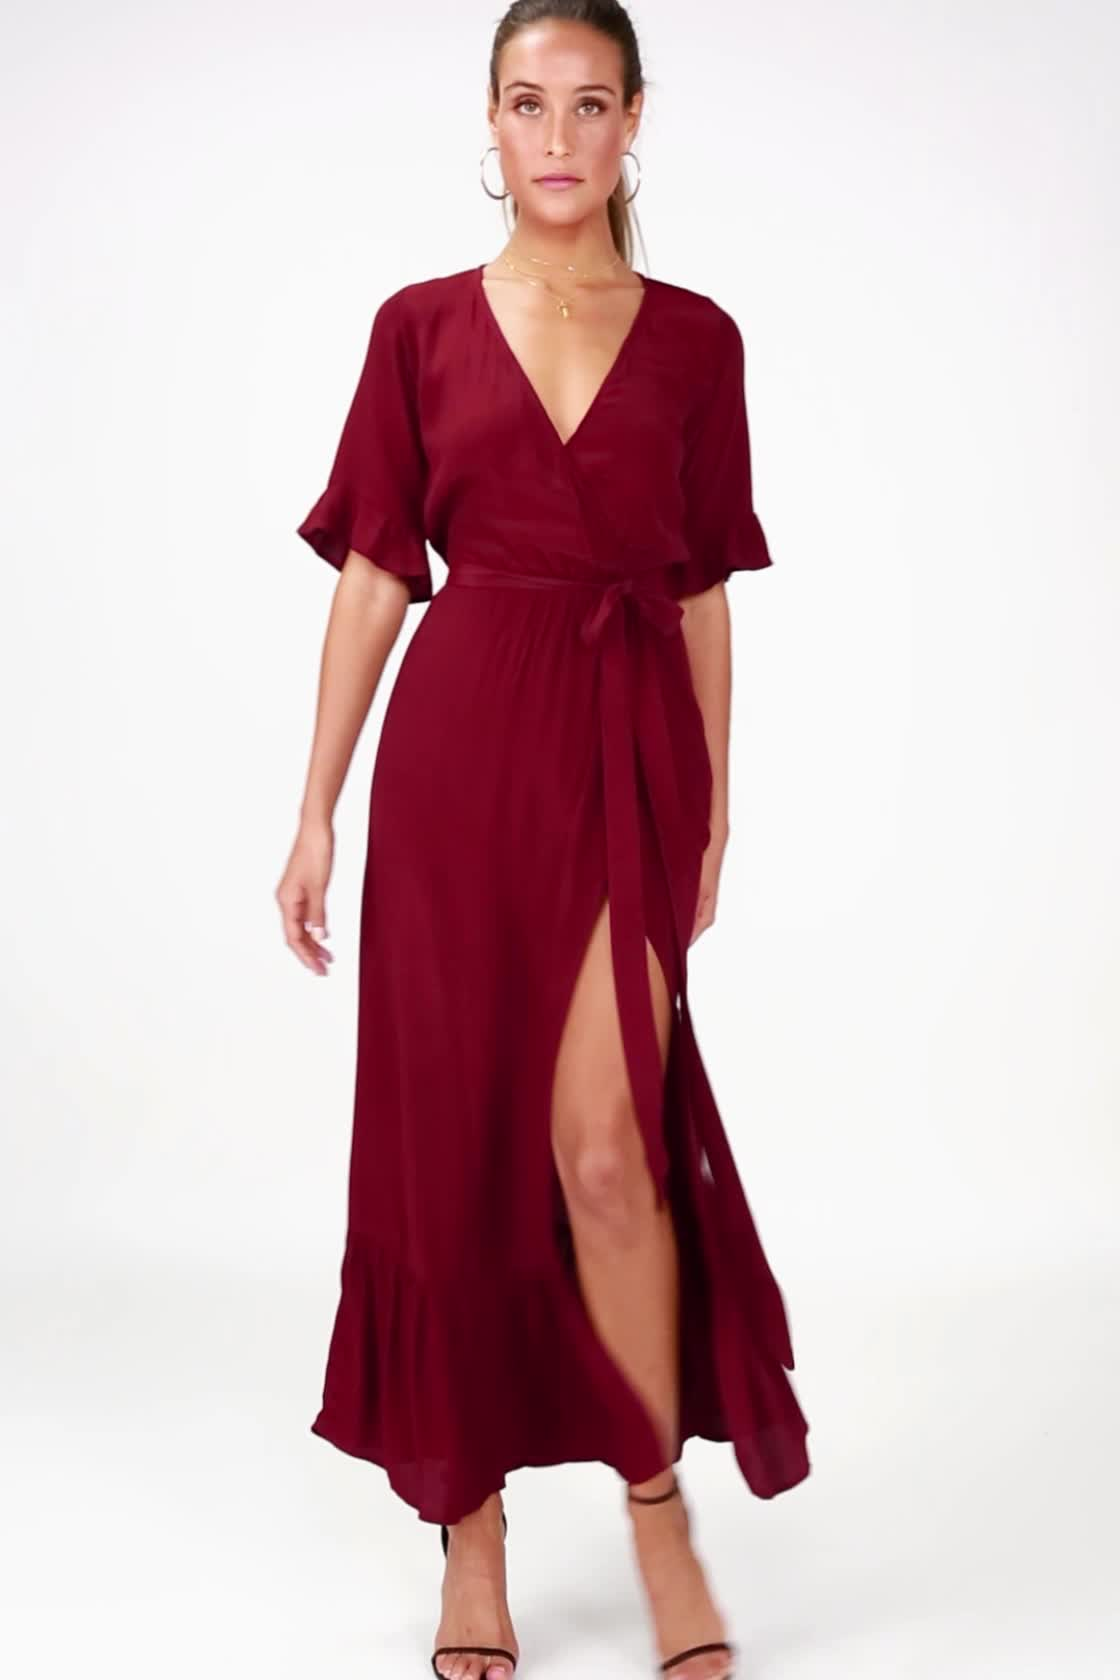 21411f1f8702 Lucy Love Enchanted Dress - Wine Red Midi Dress - Wrap Dress